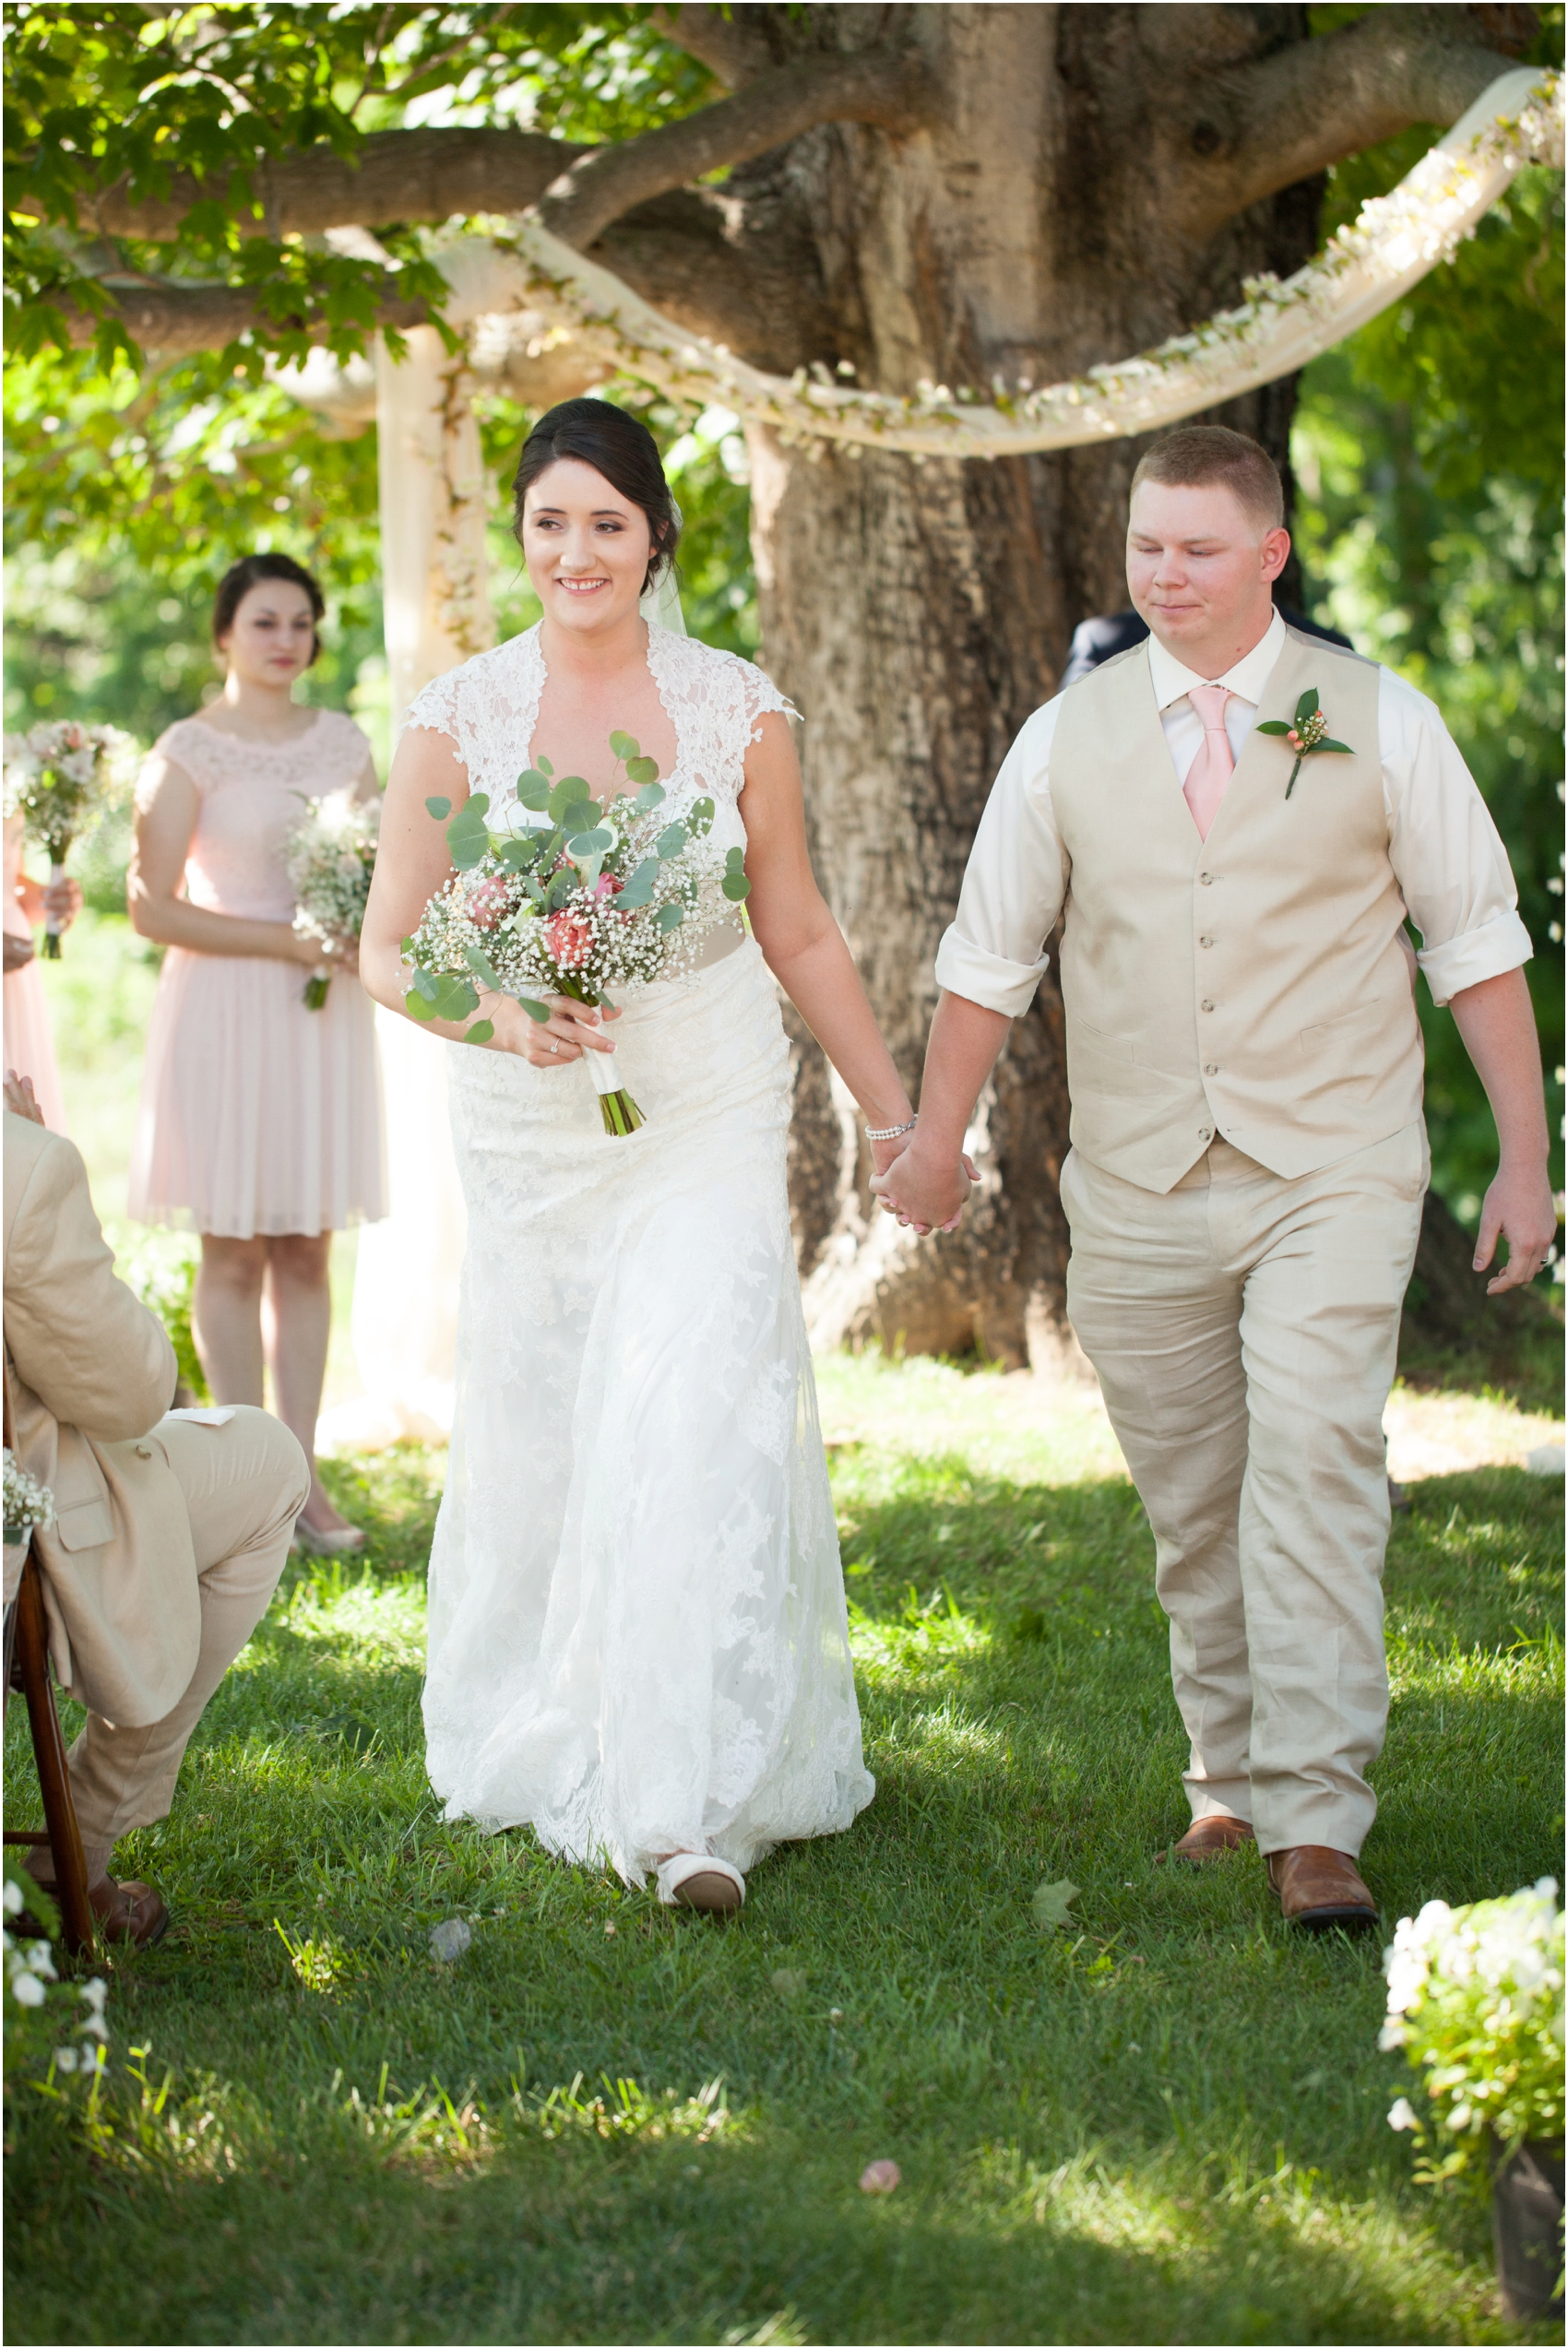 Rodes Farm Charlottesville VA Wedding-1-5.jpg